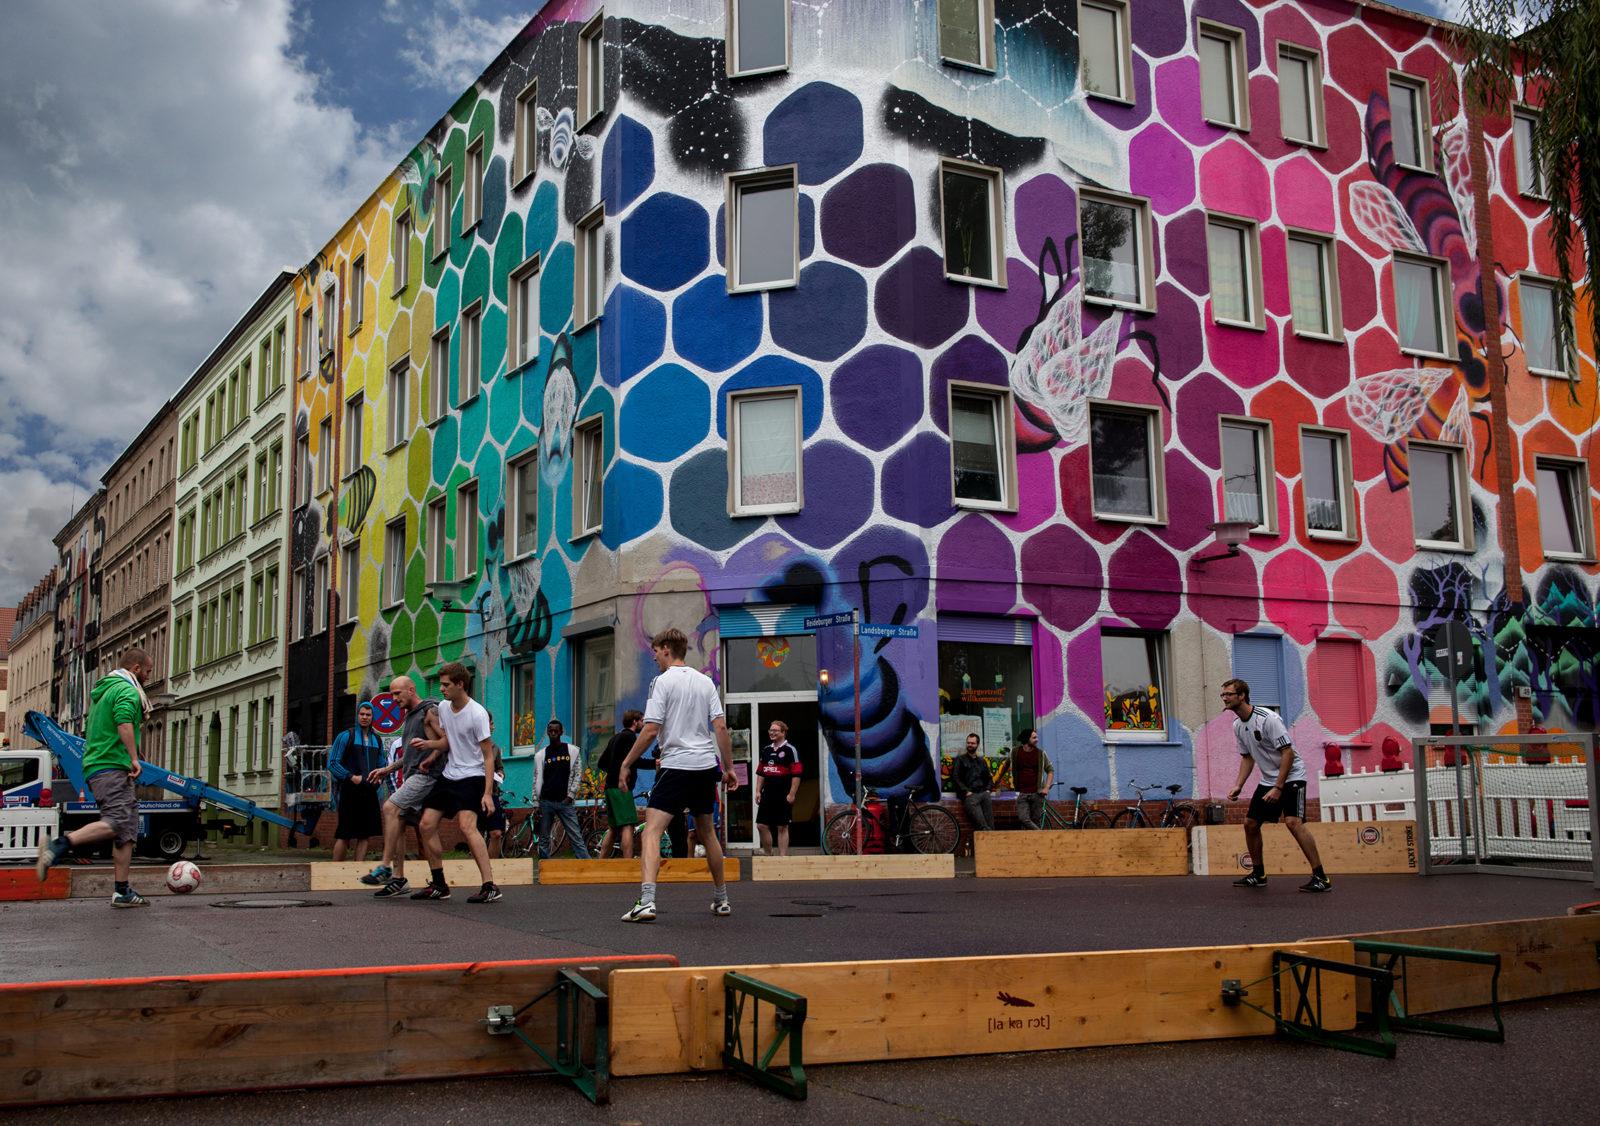 Halle ville allemande streetart Freiraumpokal himmel football - Désertée, la ville allemande de Halle reprend vie grâce au street art